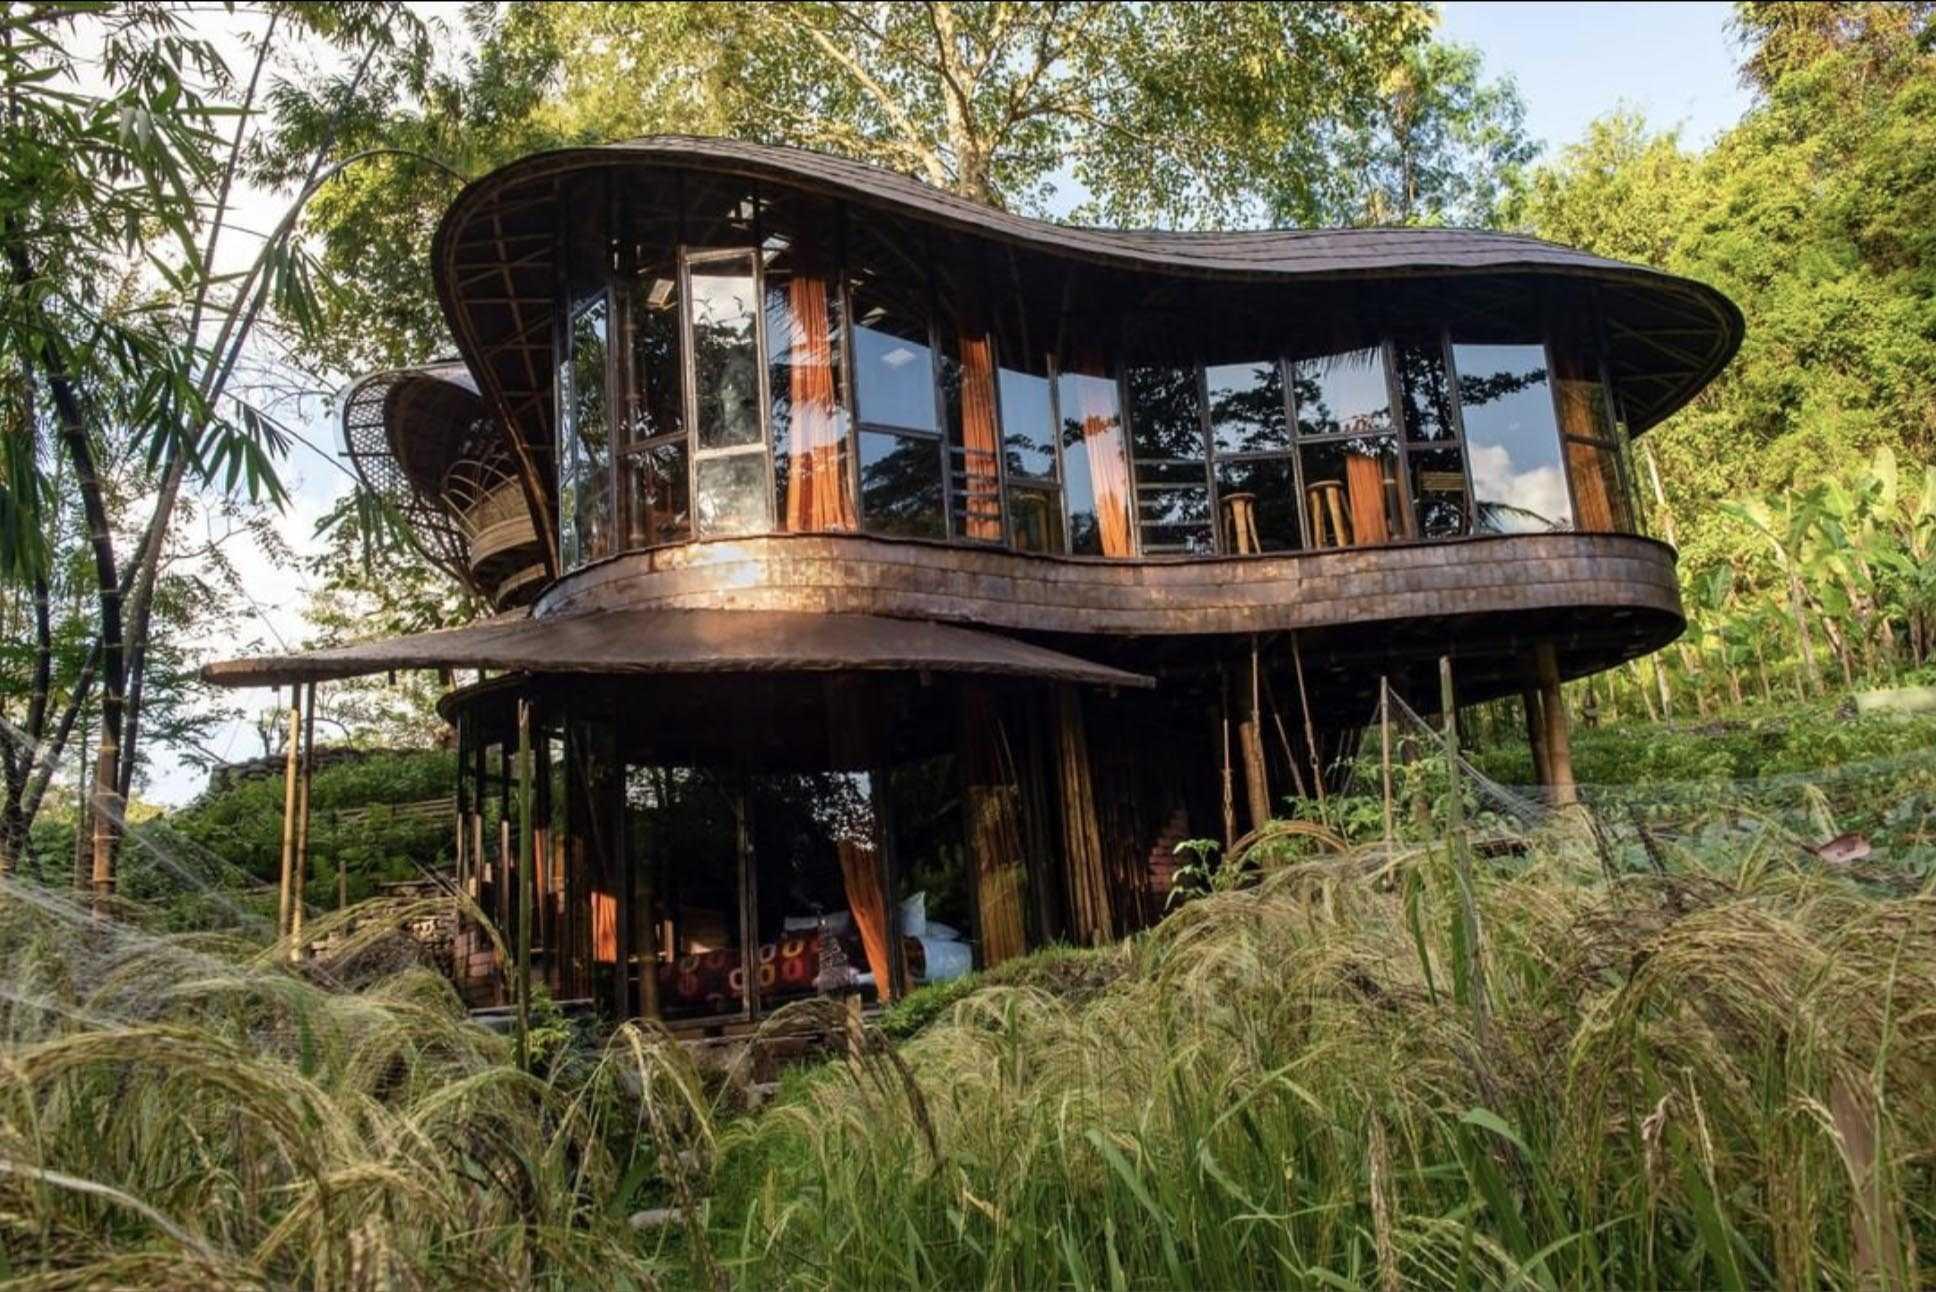 Agung Budi Raharsa | Architecture & Engineering Riverbend Bamboo House - Bali Bali, Indonesia Bali, Indonesia Front View Tropical 88703